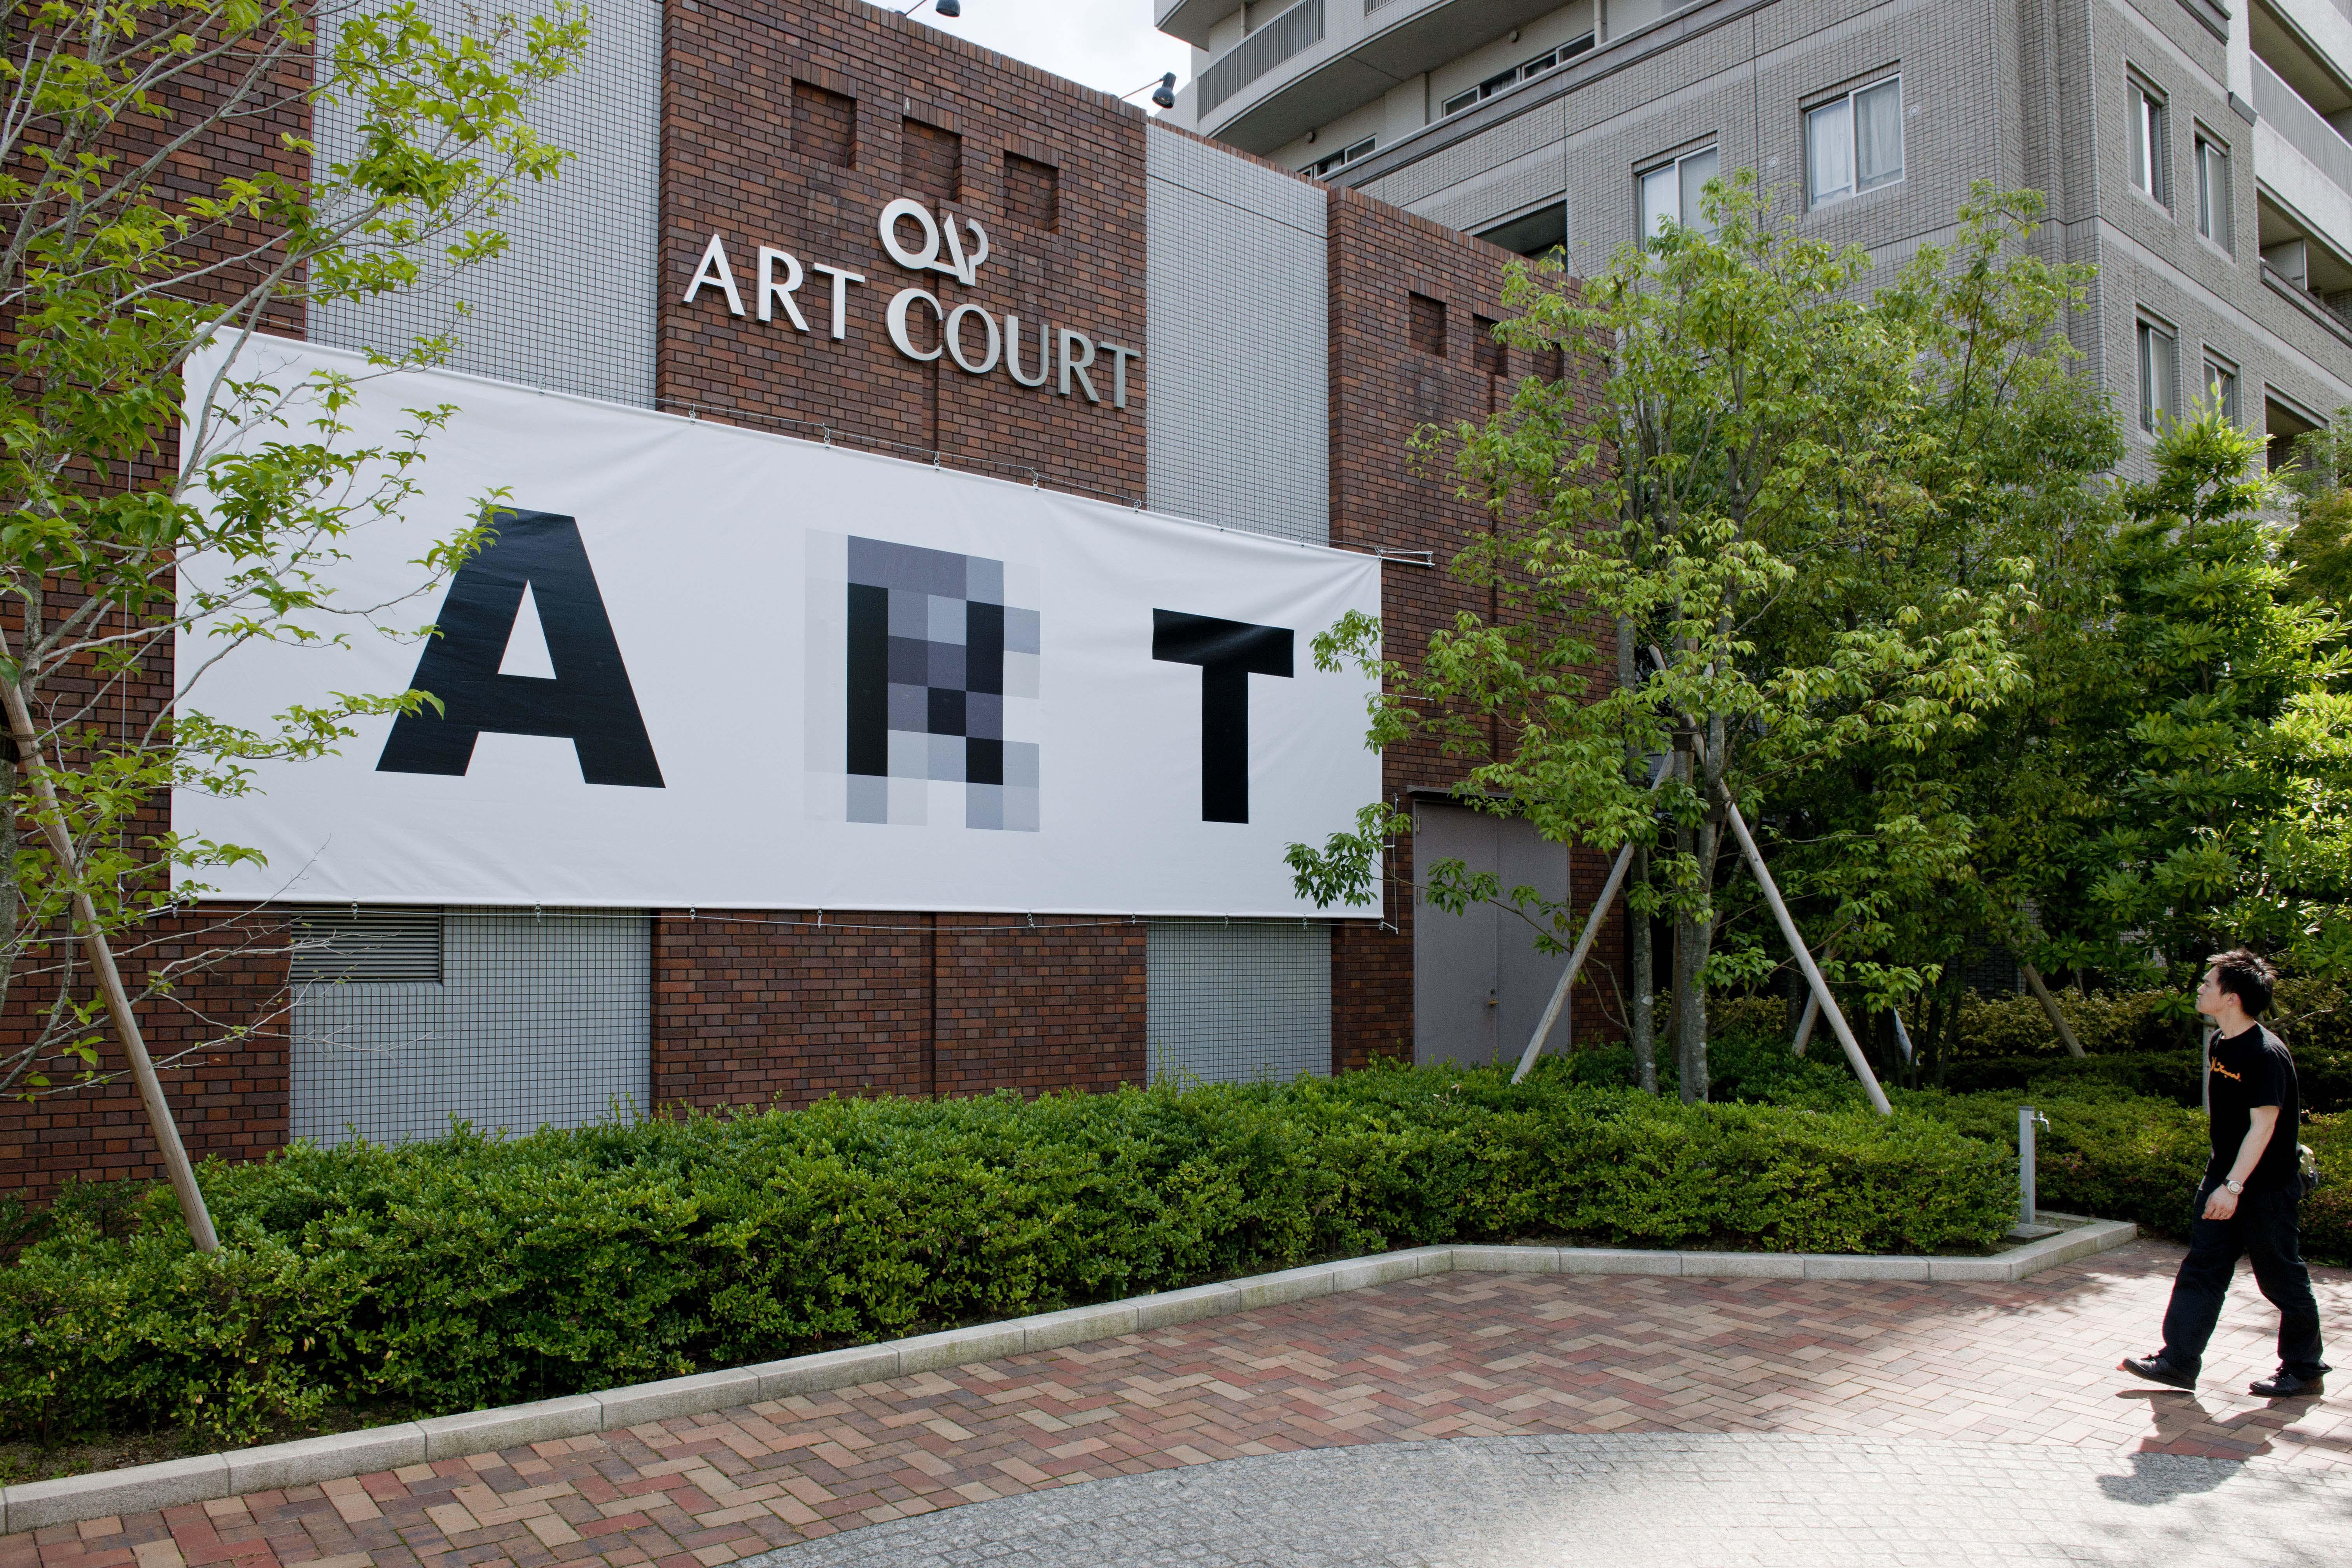 《R無指定》2010年 ビニール生地にデジタル出力 「Art Court Frontier 2010#8」(Art Court Gallery|大阪)撮影: 表 恒匡